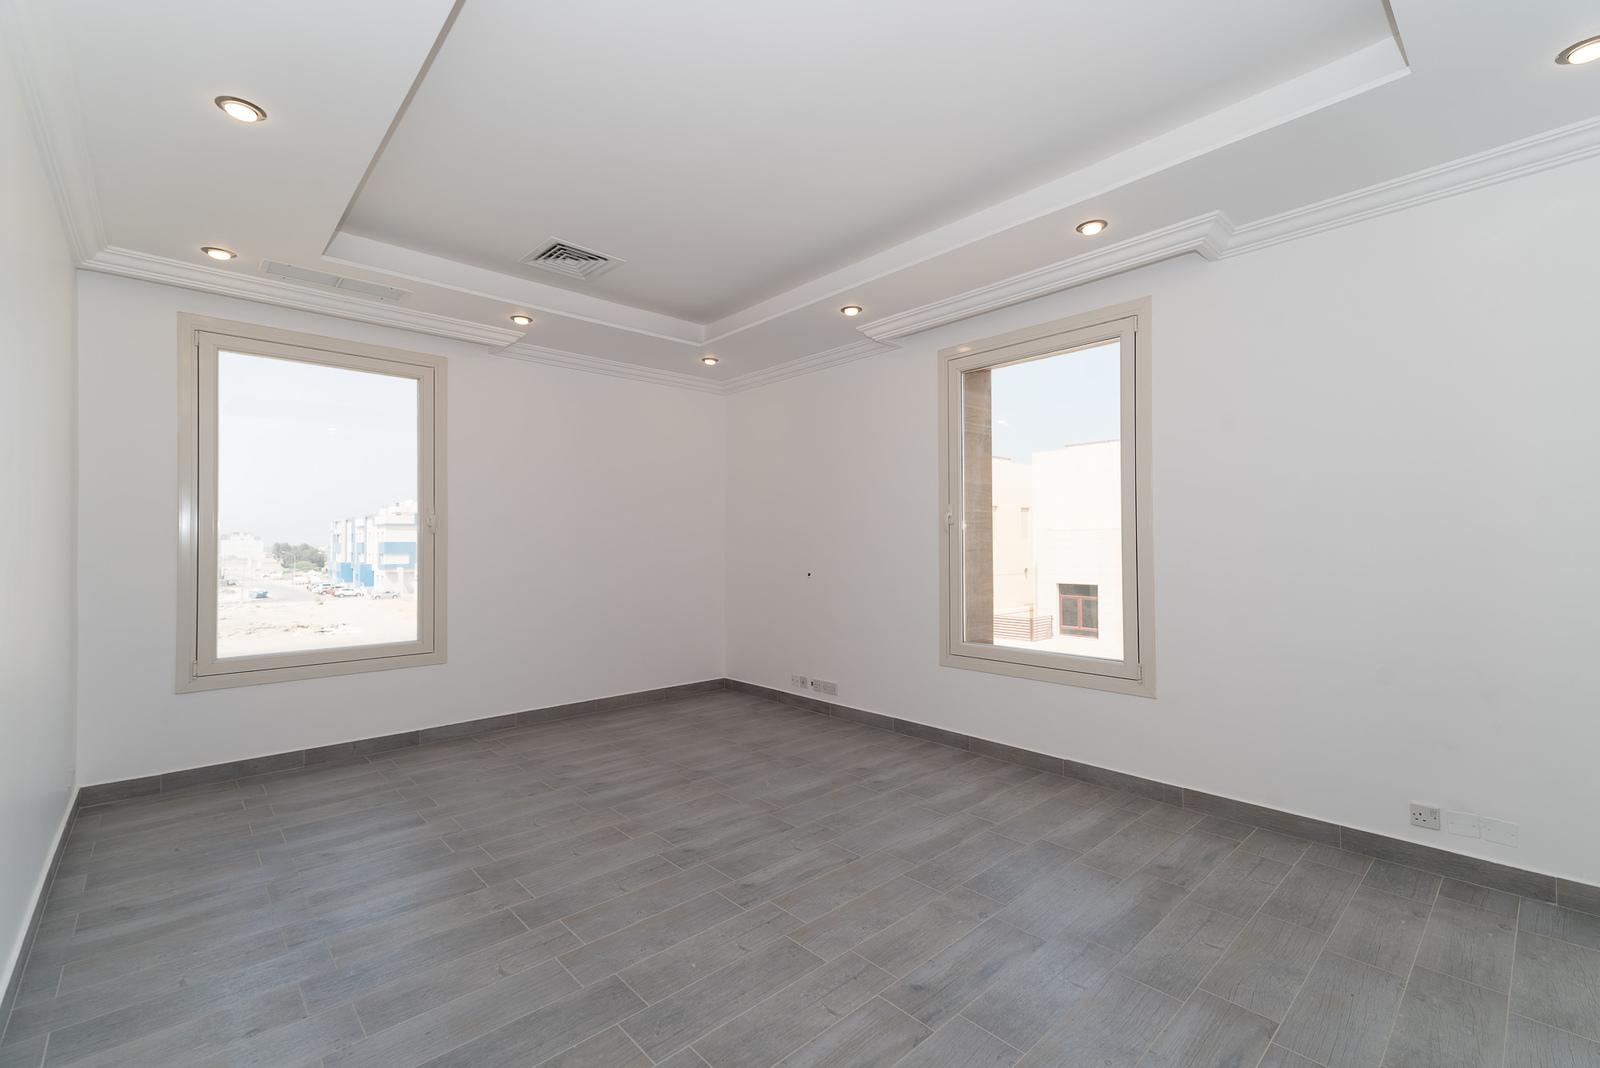 Fnaitees – new, sunny, large, three bedroom apartments